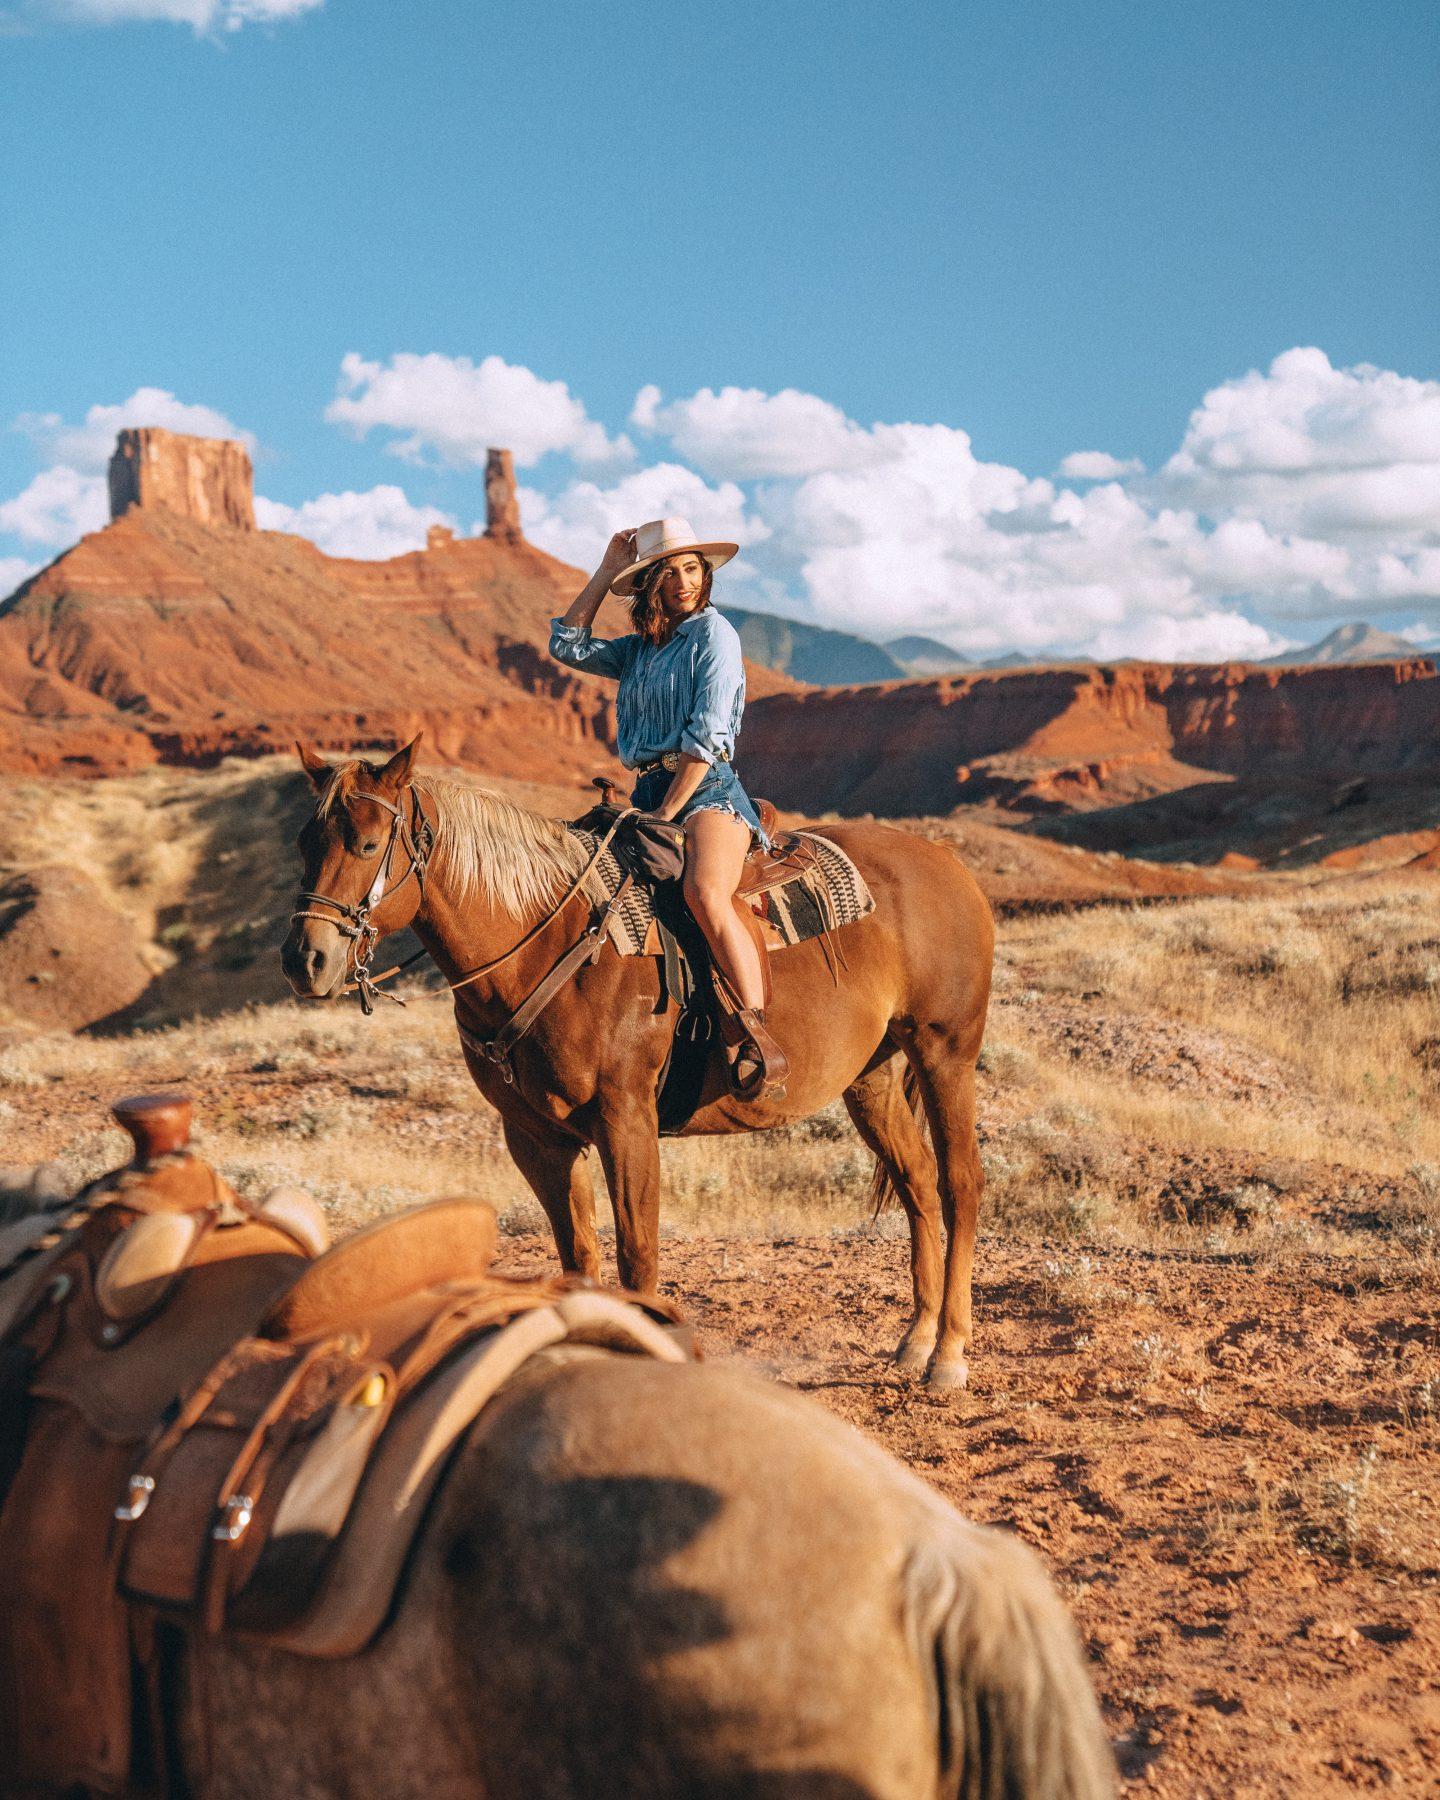 Sunset horseback ride in Moab, Utah